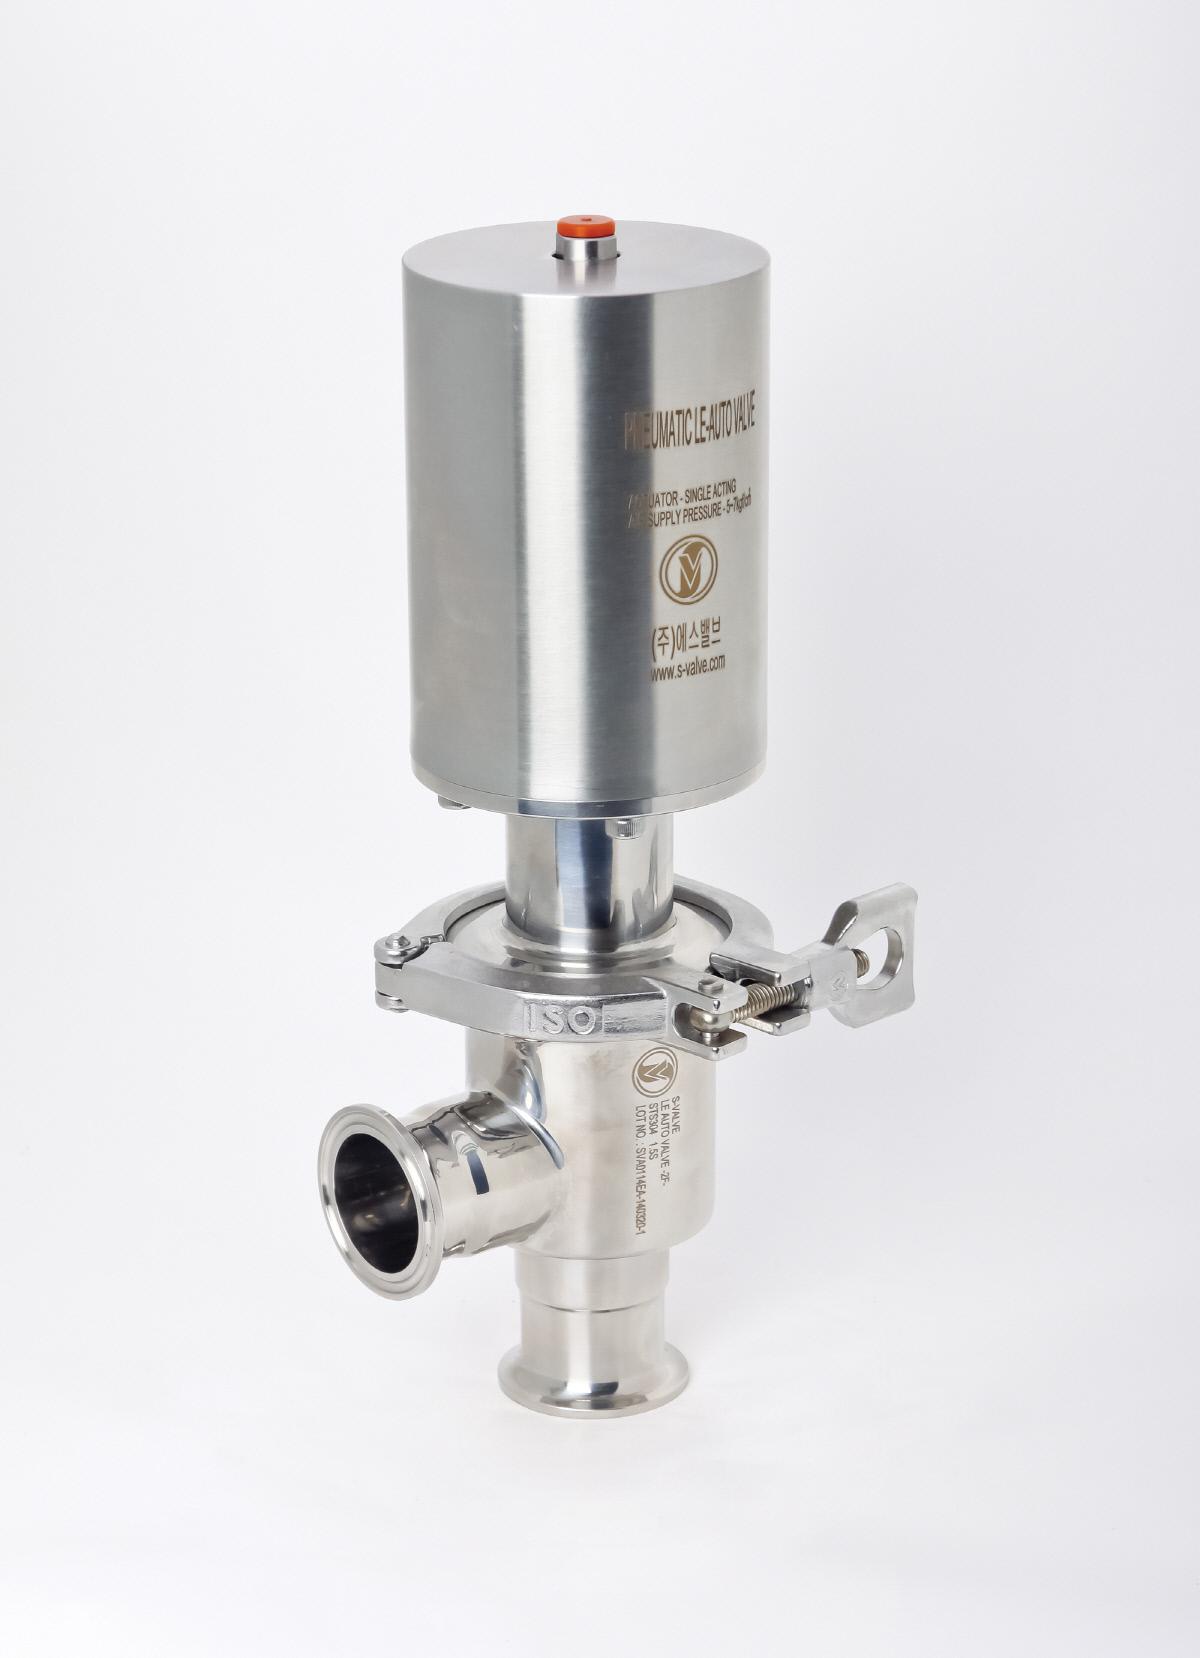 S-valve_0096.jpg